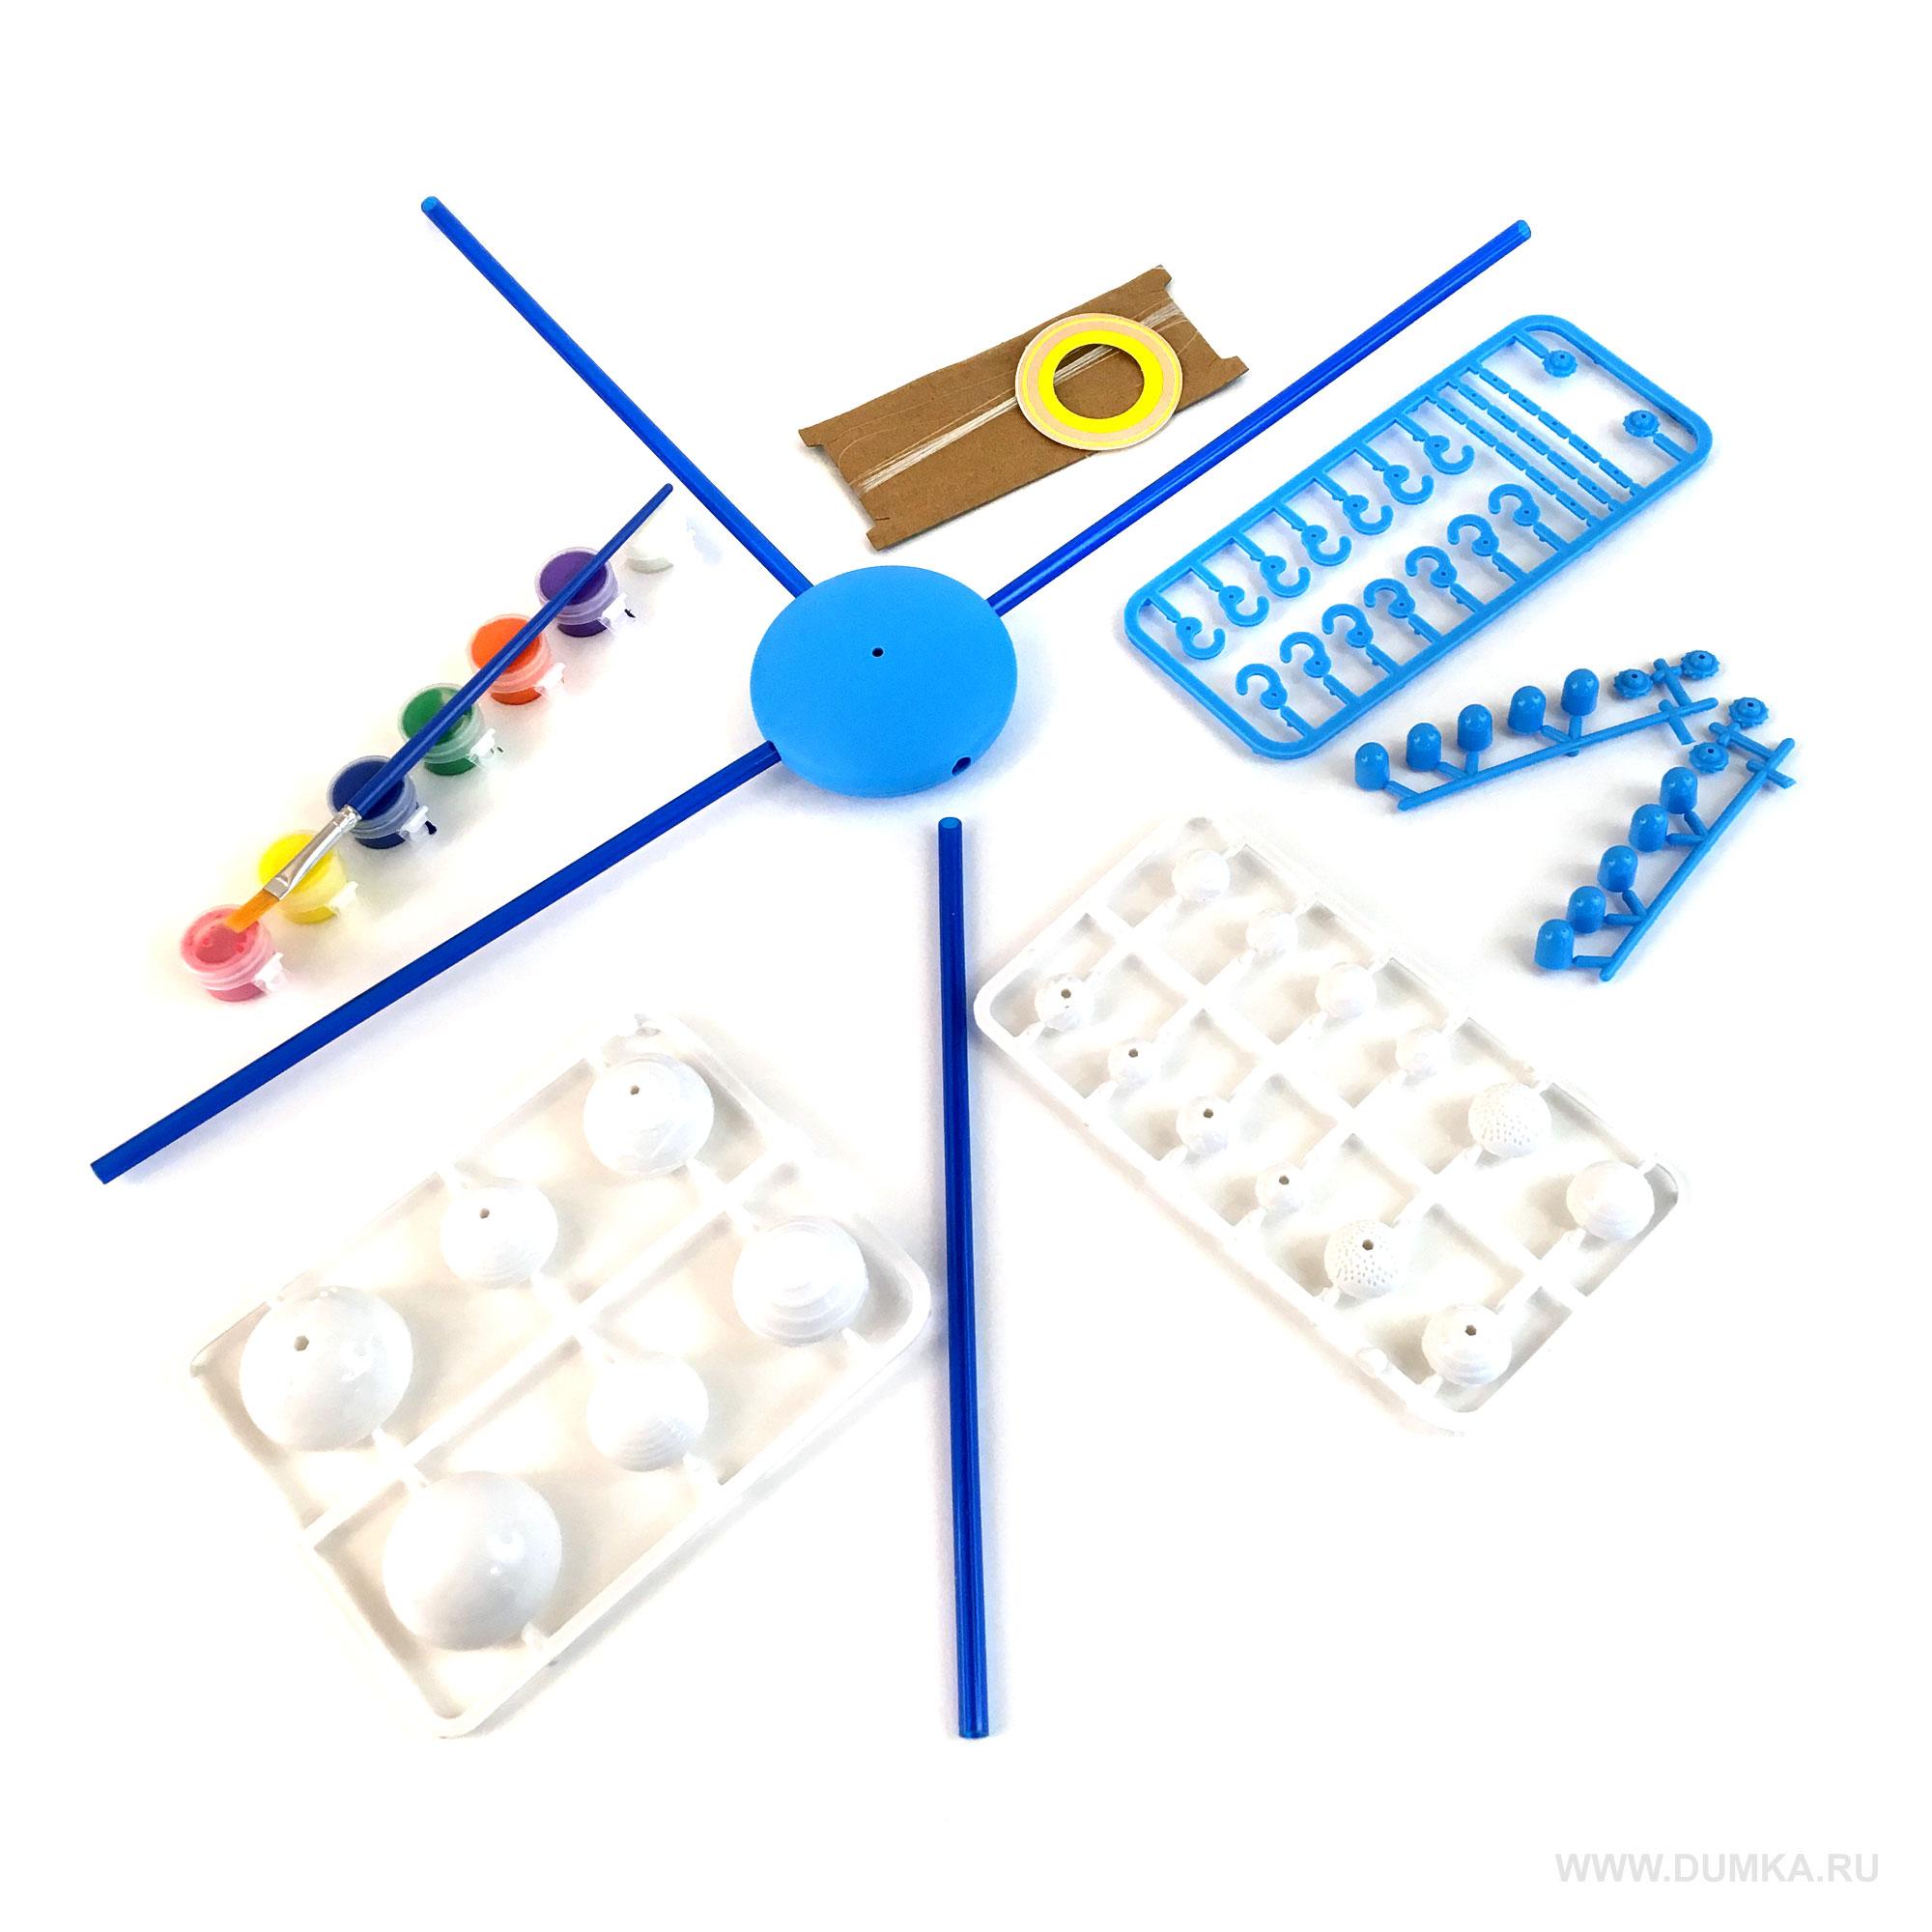 solar system model - HD